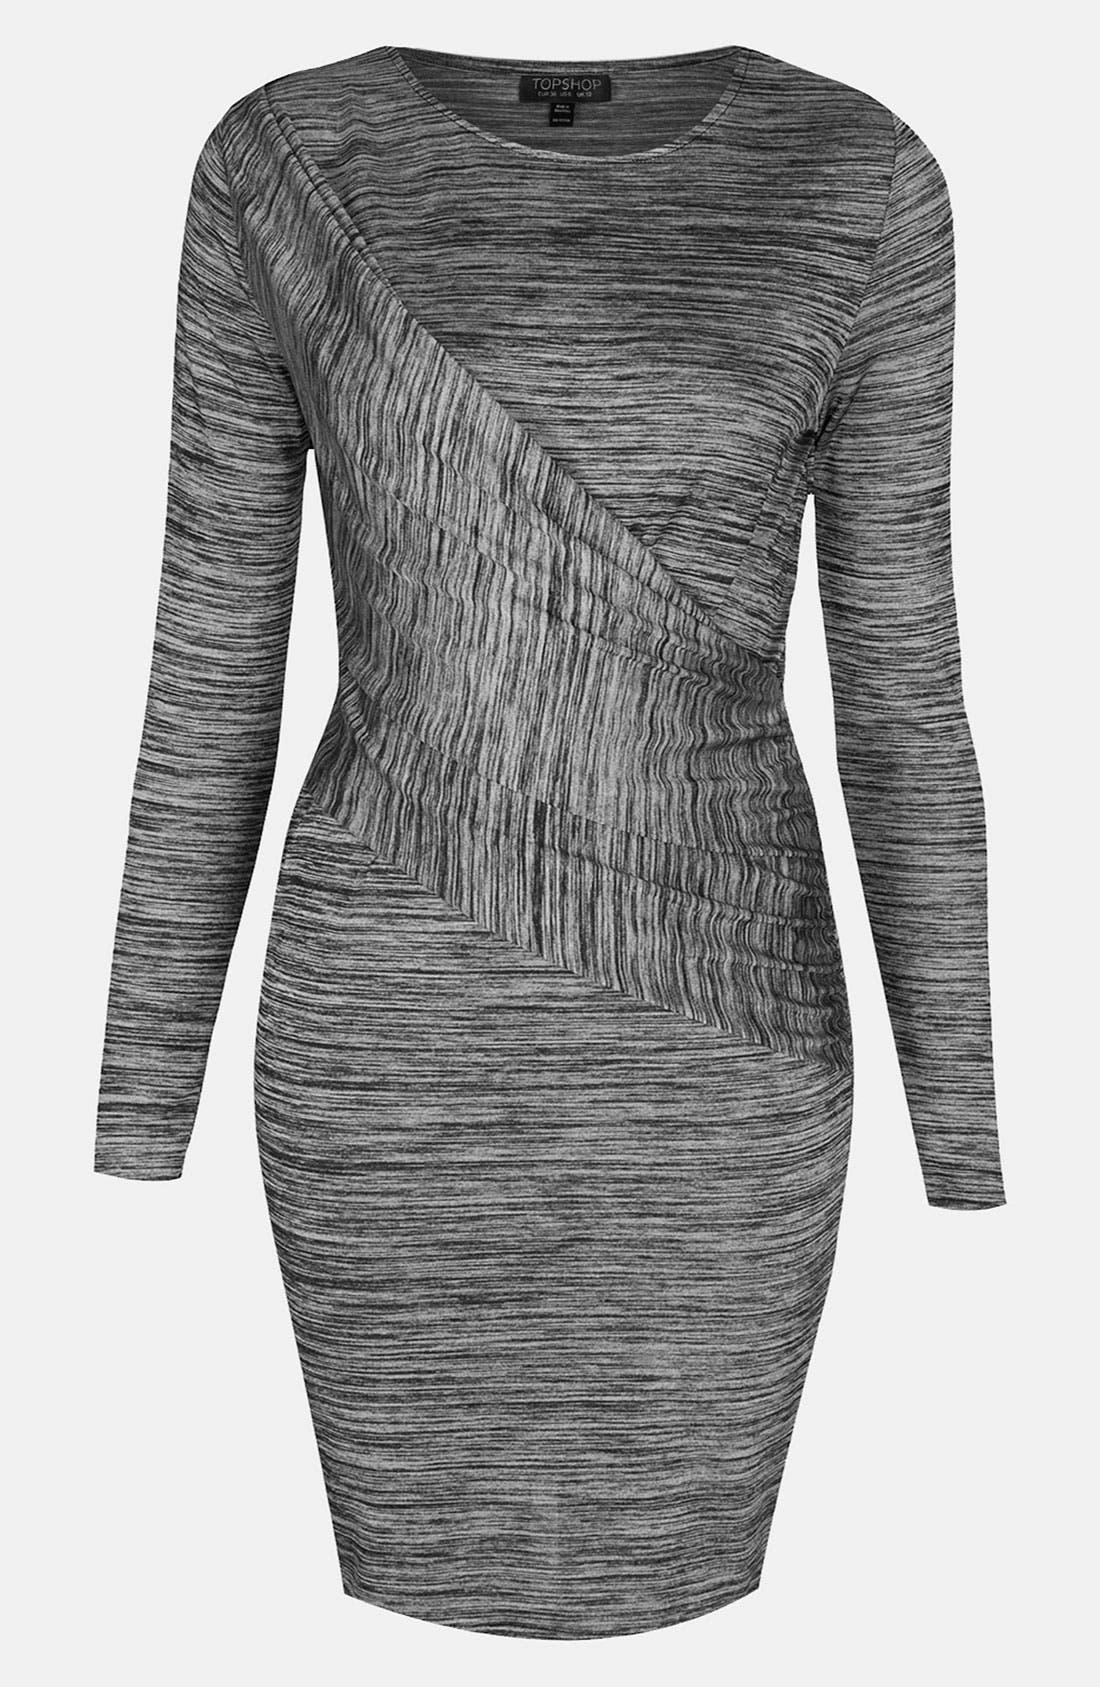 Alternate Image 1 Selected - Topshop Space Dye Draped Body-Con Dress